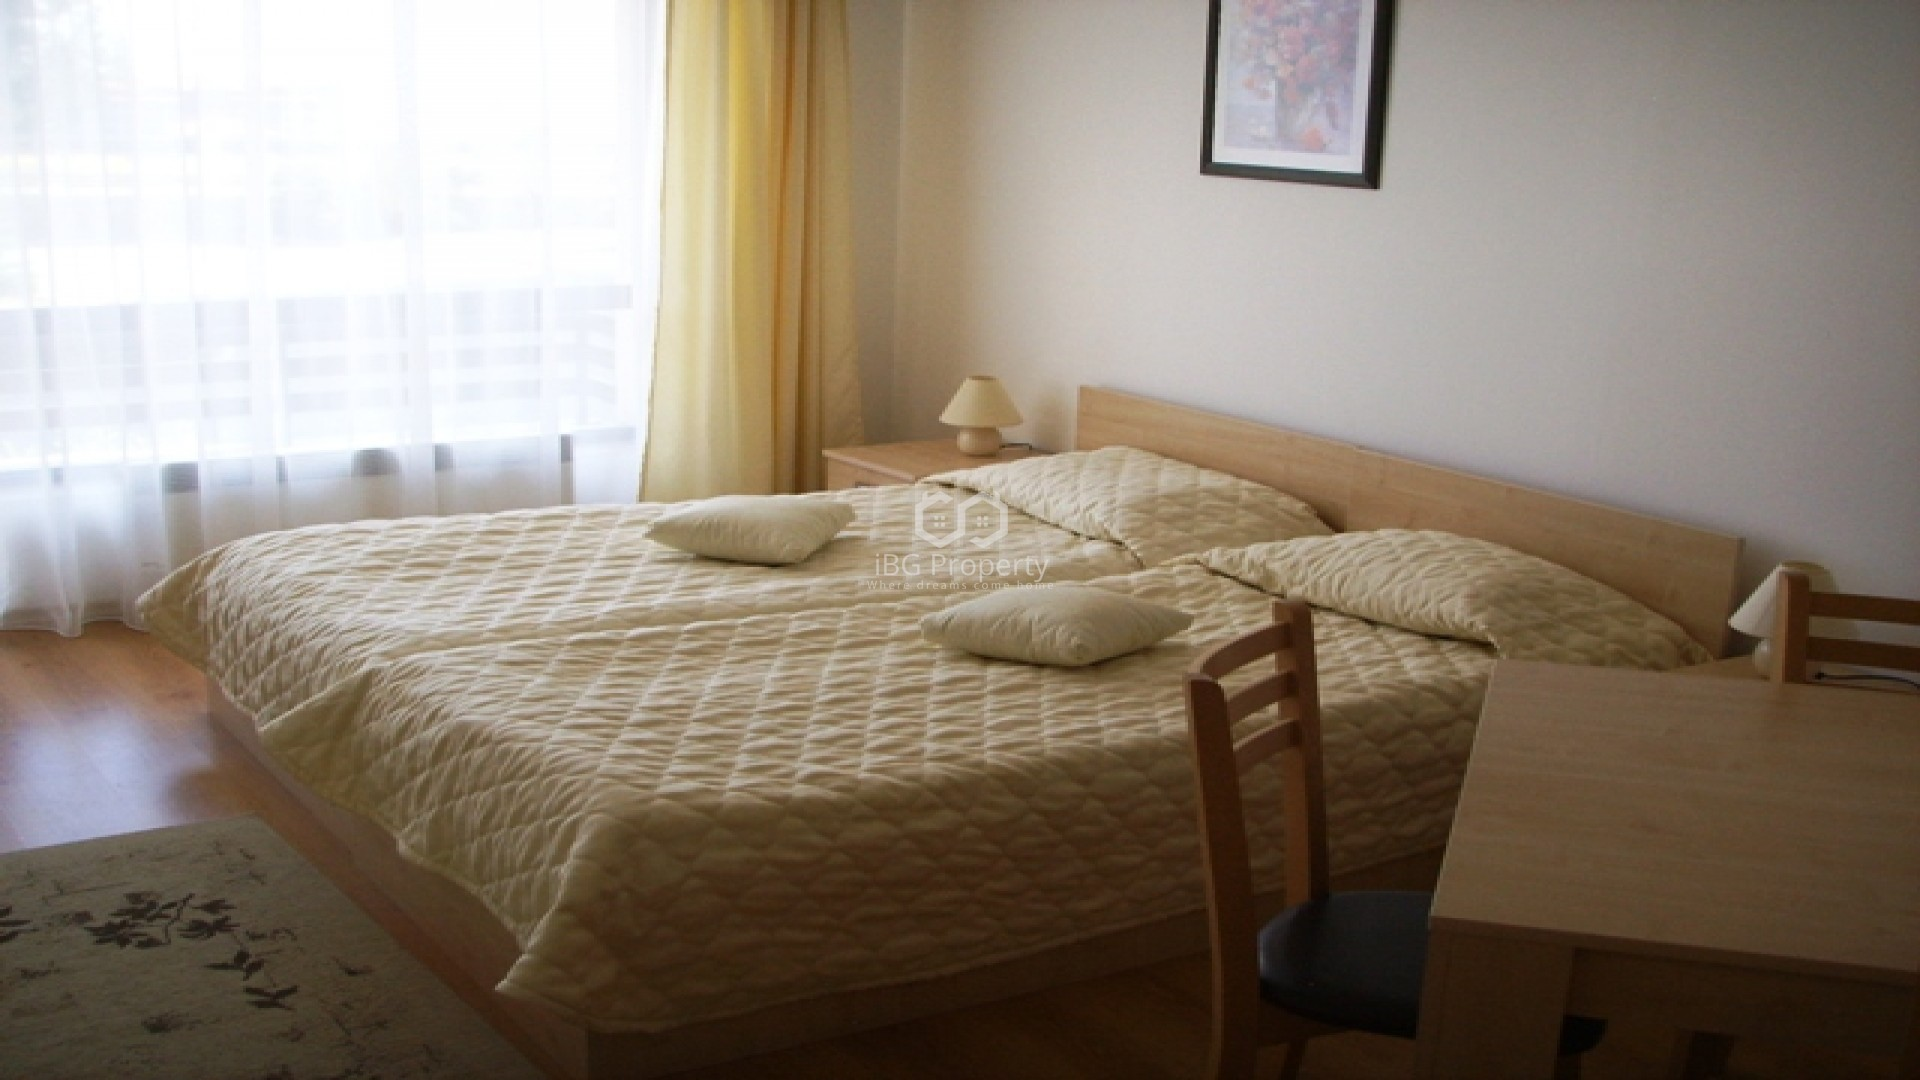 Однокомнатная квартира Банско 44 m2